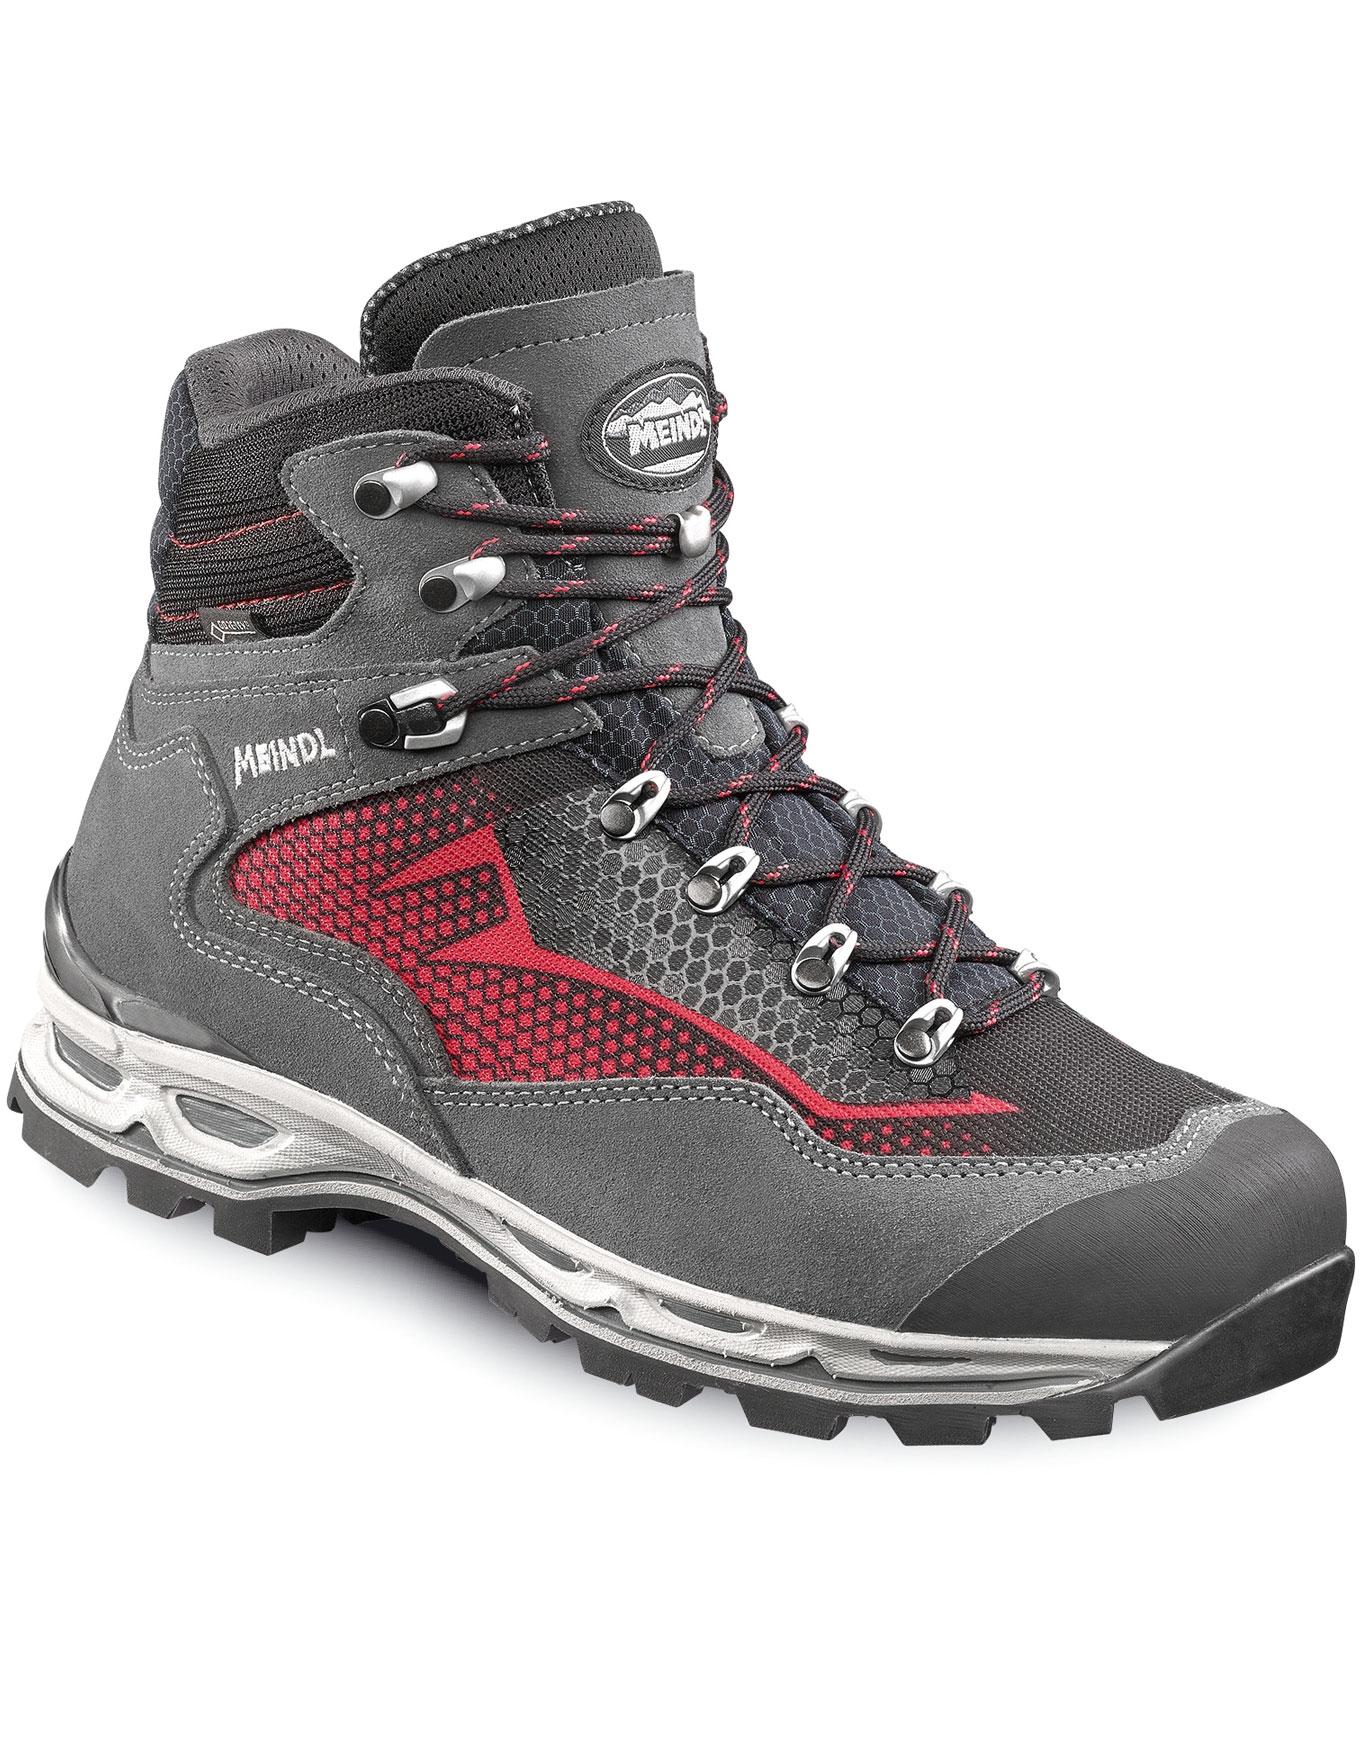 Bouthan Gtx Millet : Chaussures randonnée homme : Snowleader